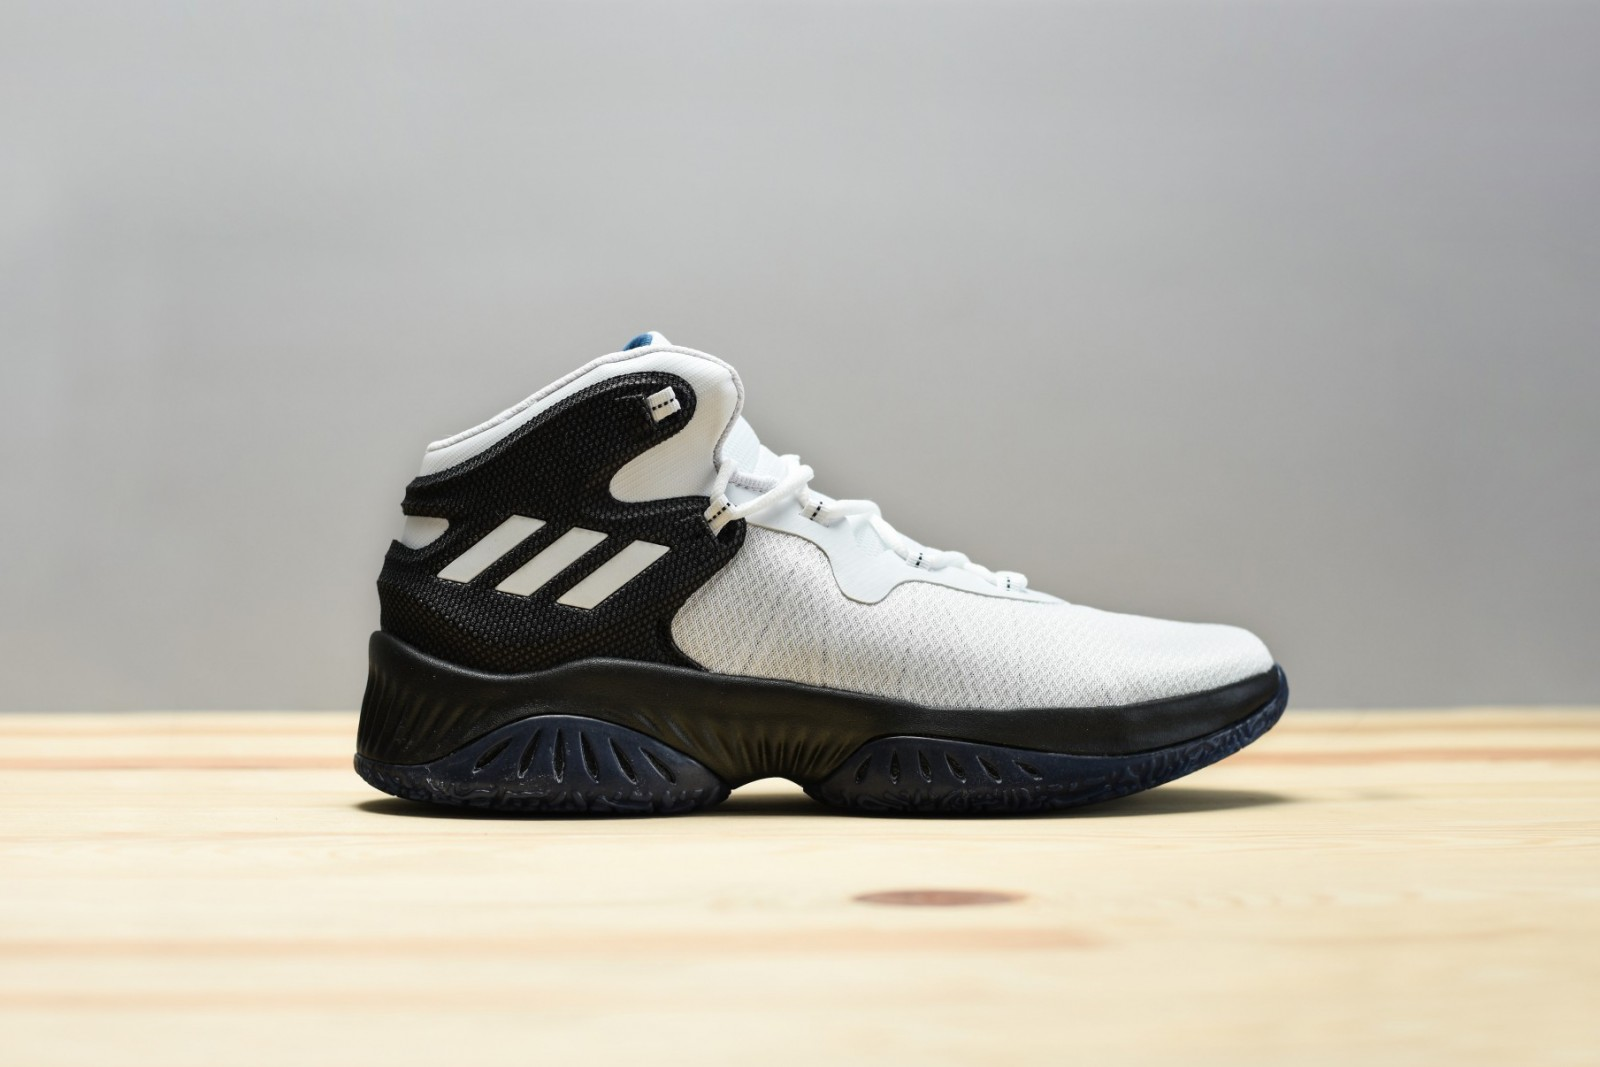 0546d820a26 Pánské Basketbalové boty adidas Performance Explosive Bounce